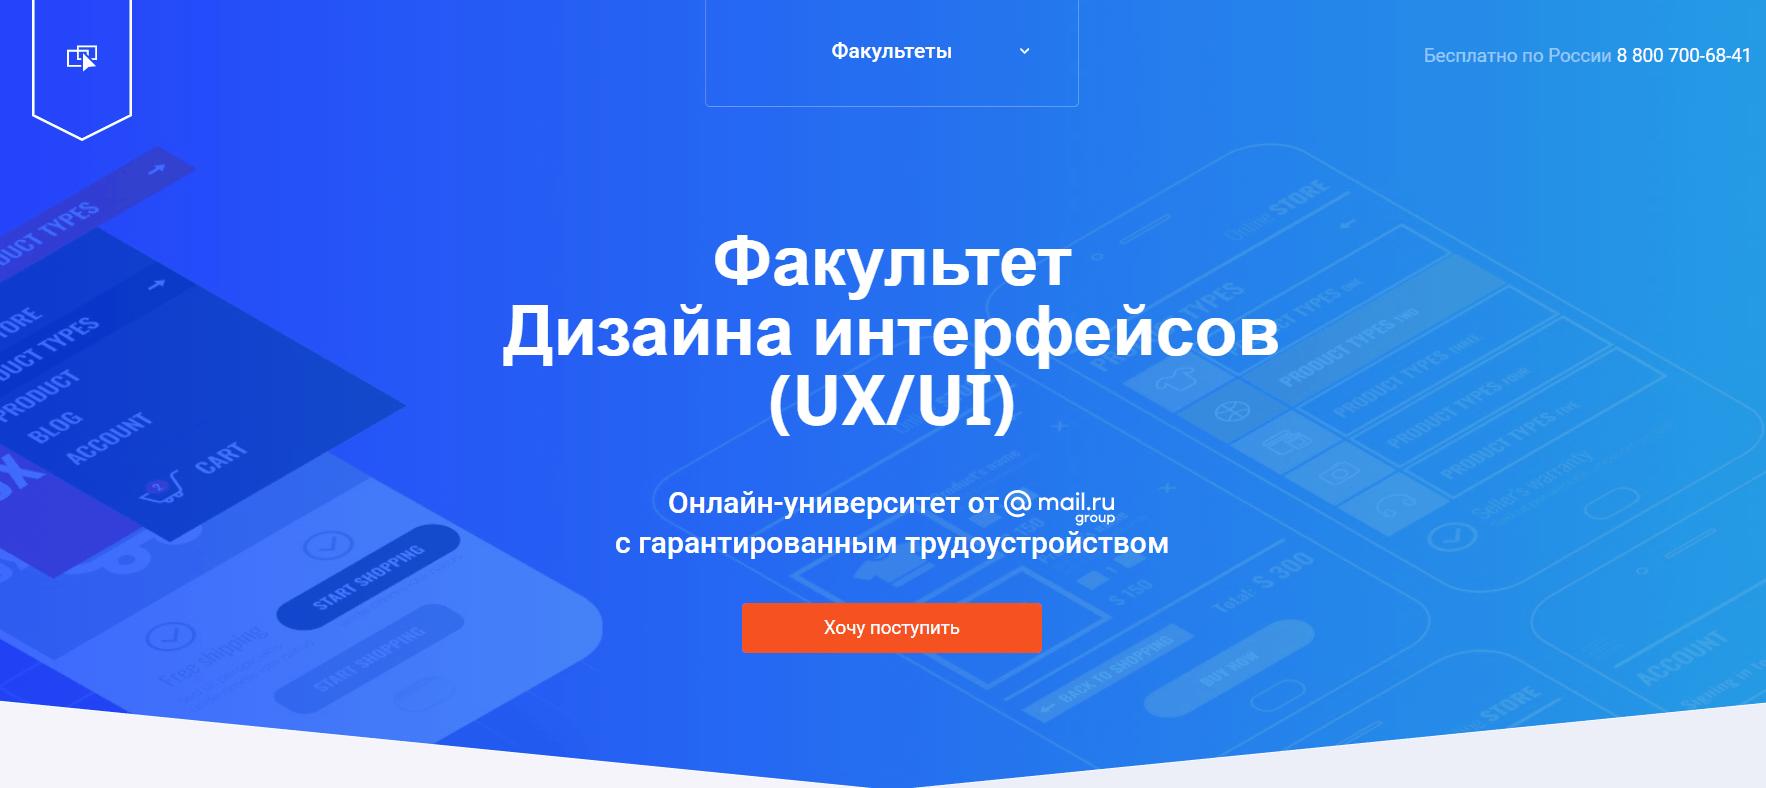 Факультет Дизайна интерфейсов (UX/UI) от Mail.ru Group